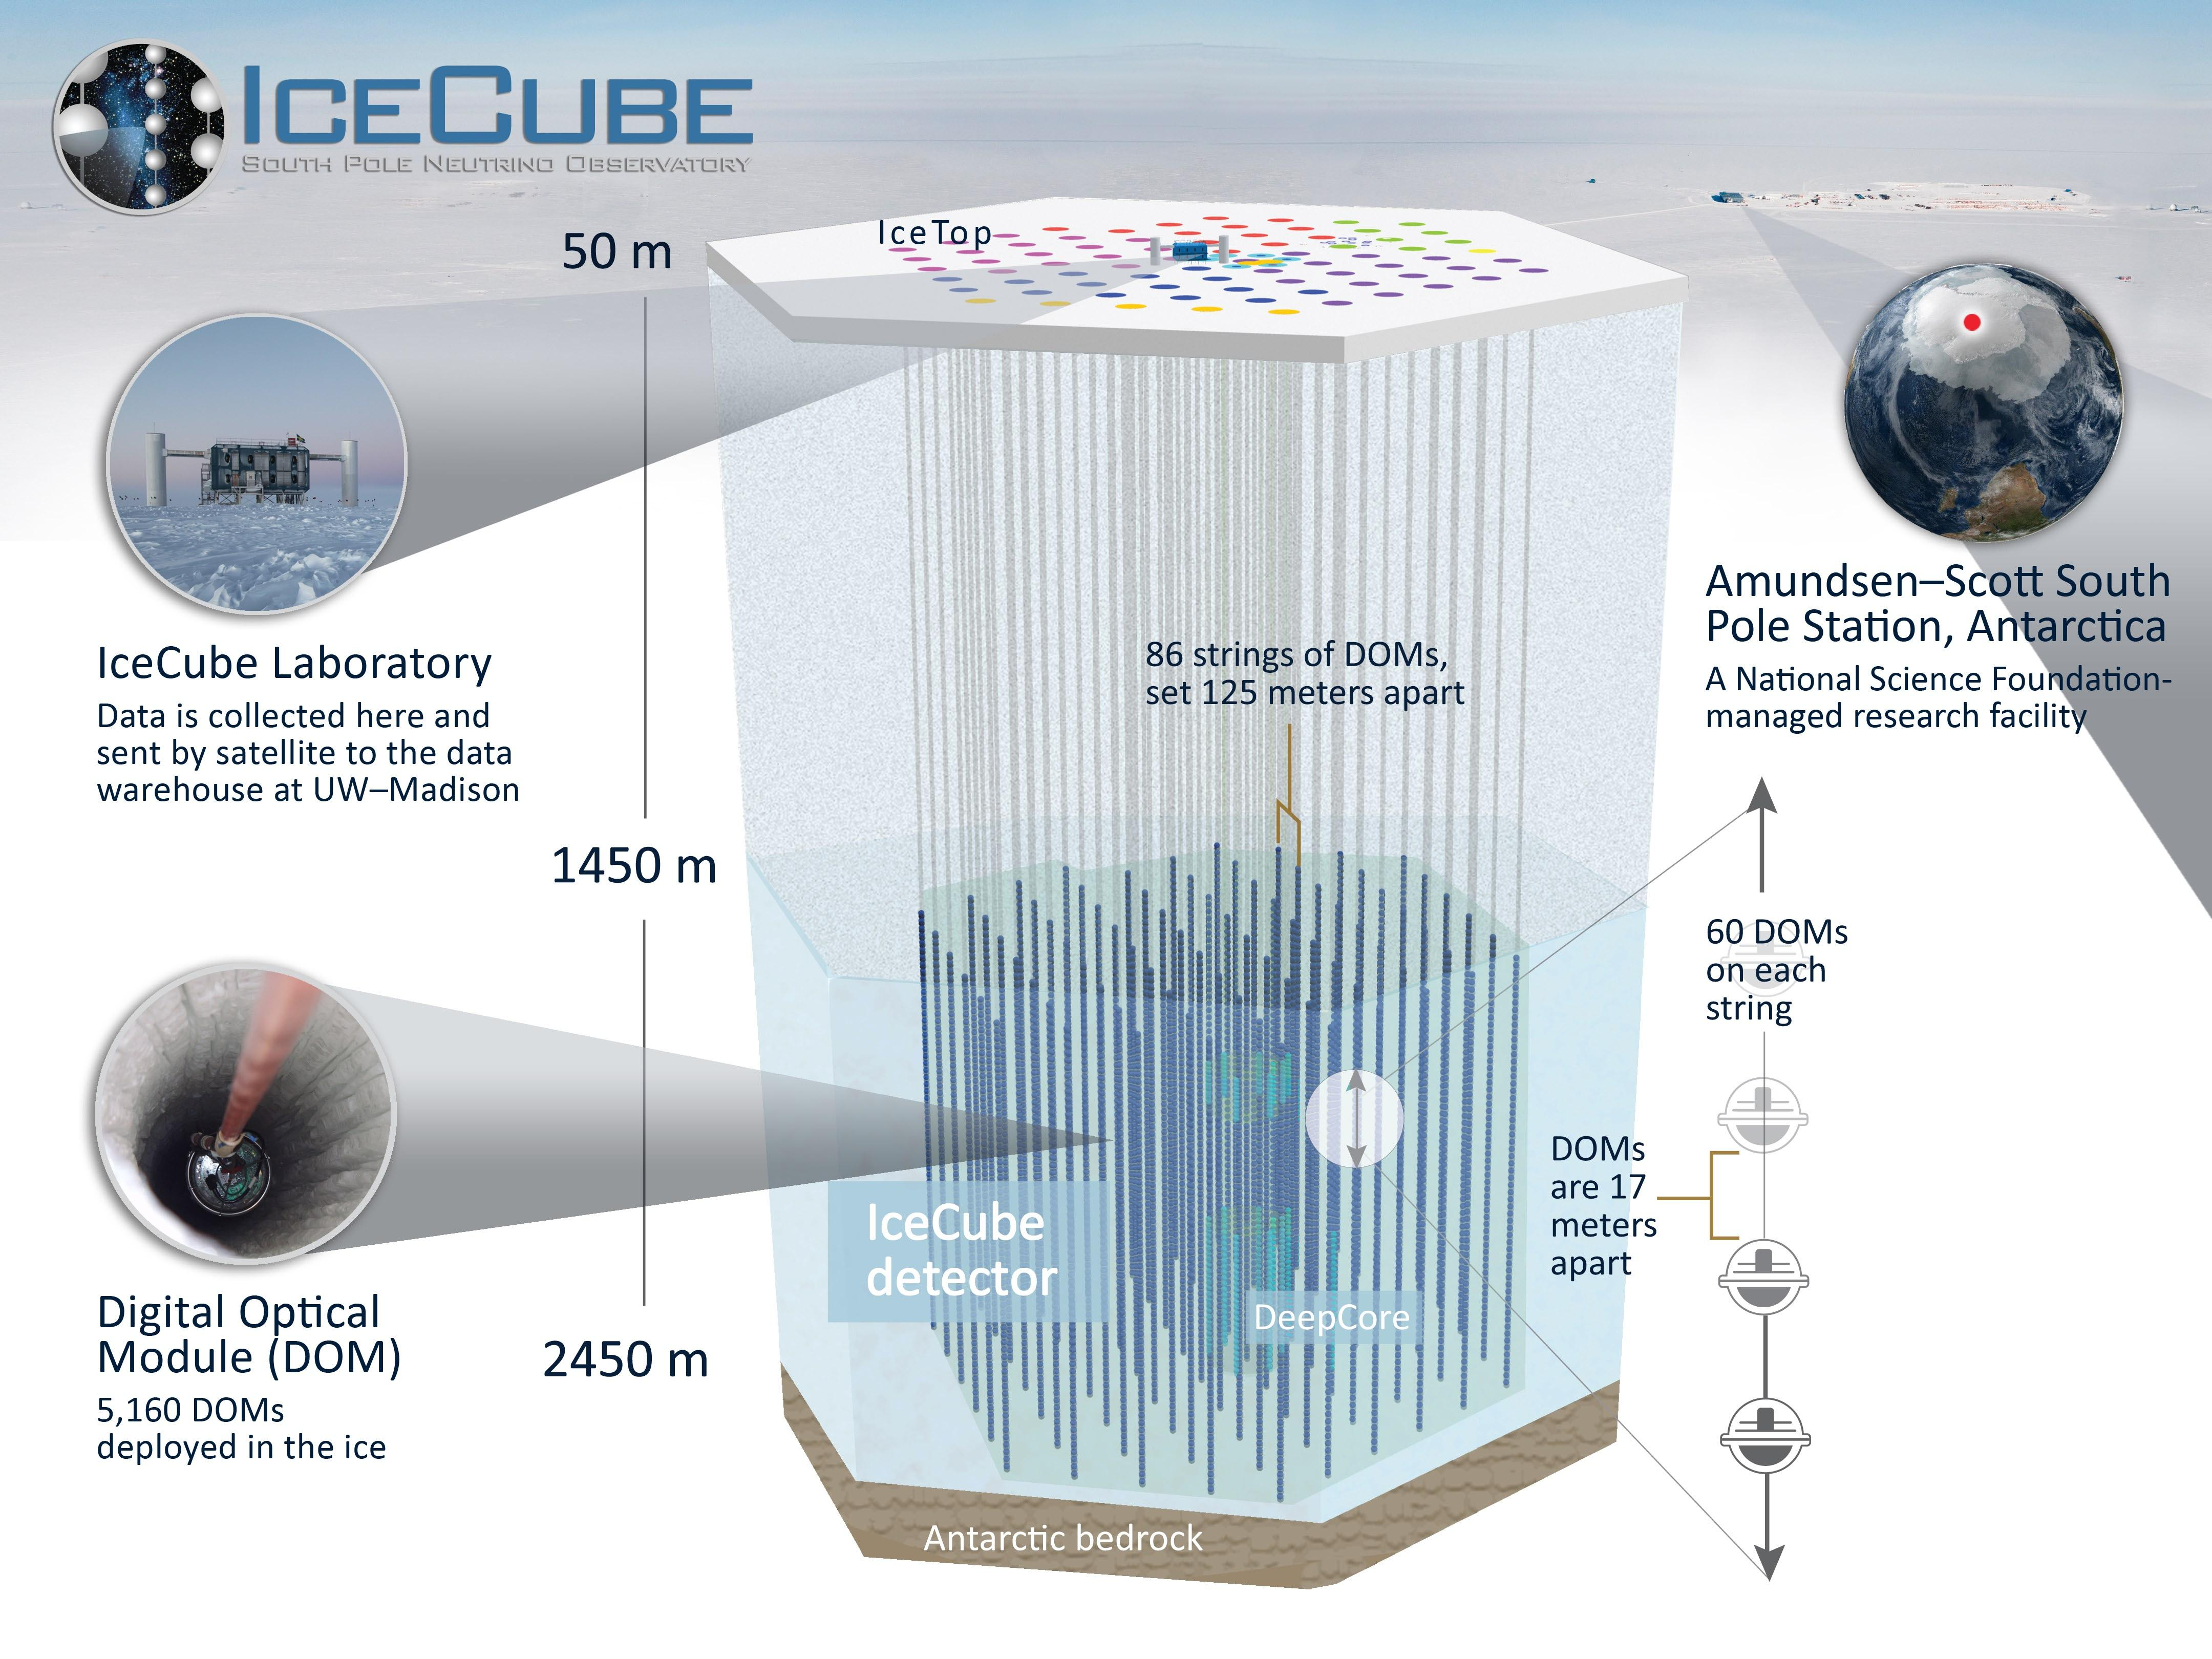 IceCube and the tale of the Big Bird neutrino - CSIROscopeIcecube Neutrino